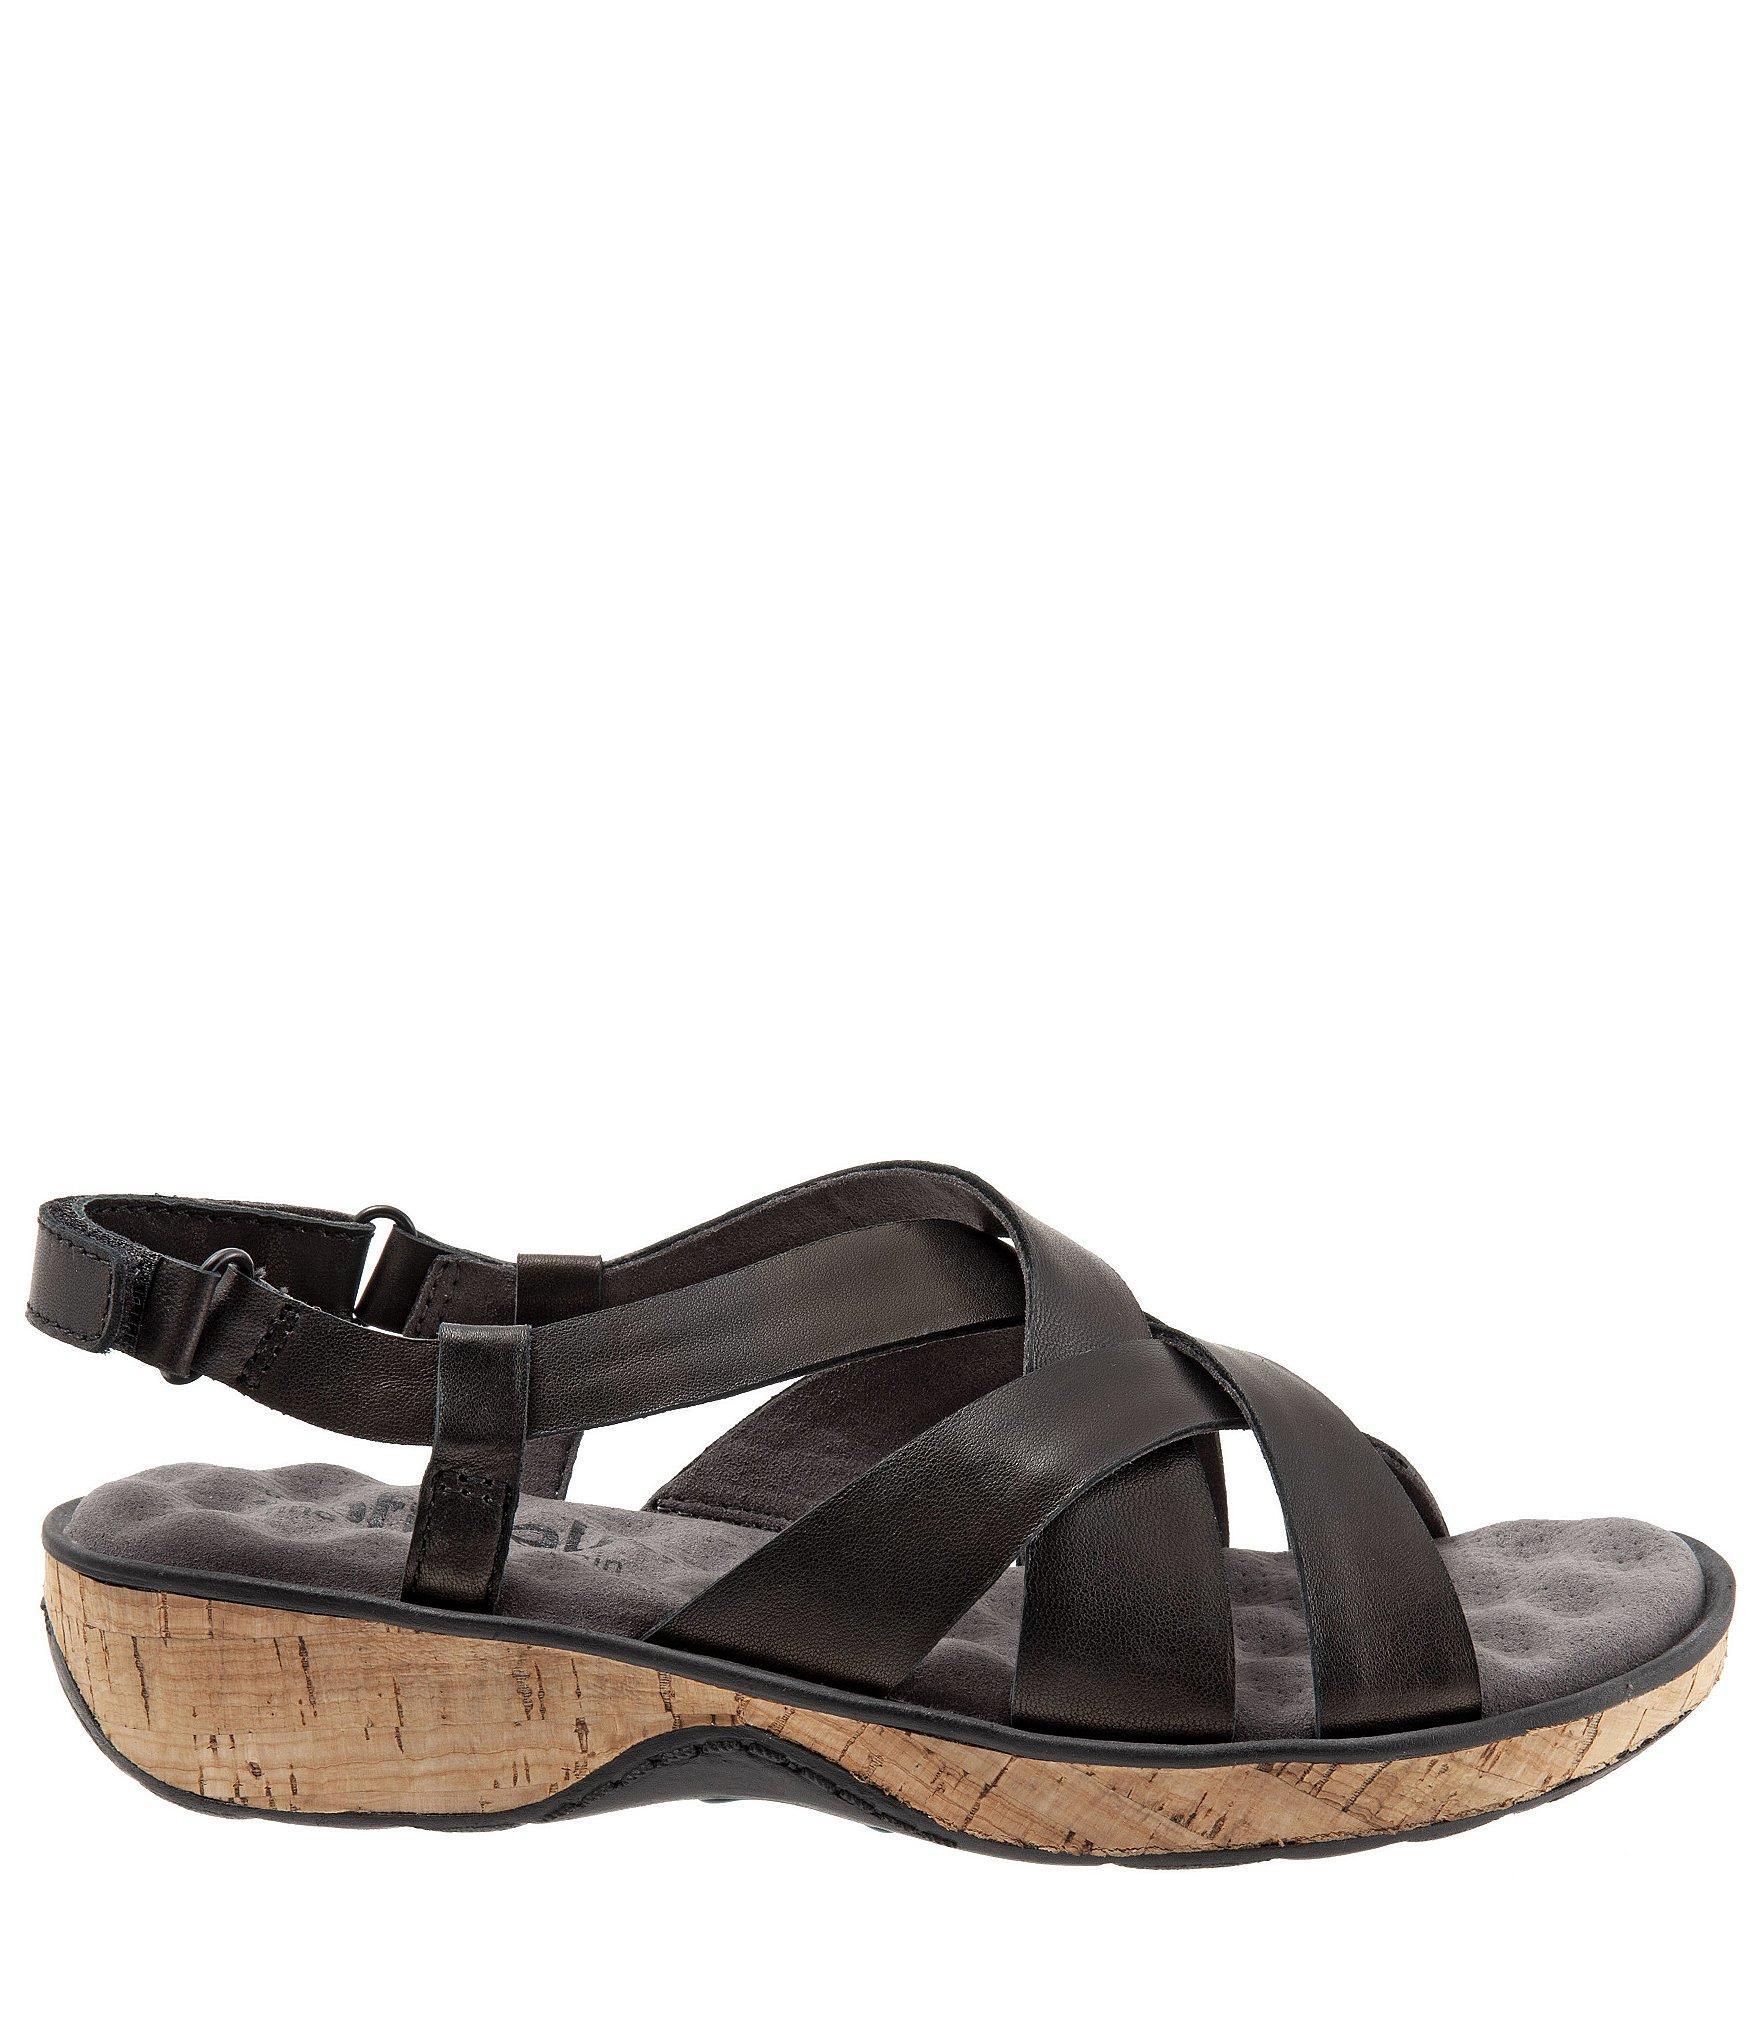 9a3427ba762e2c ... Black Bonaire Leather Criss-cross Strap Sandals - Lyst. View fullscreen